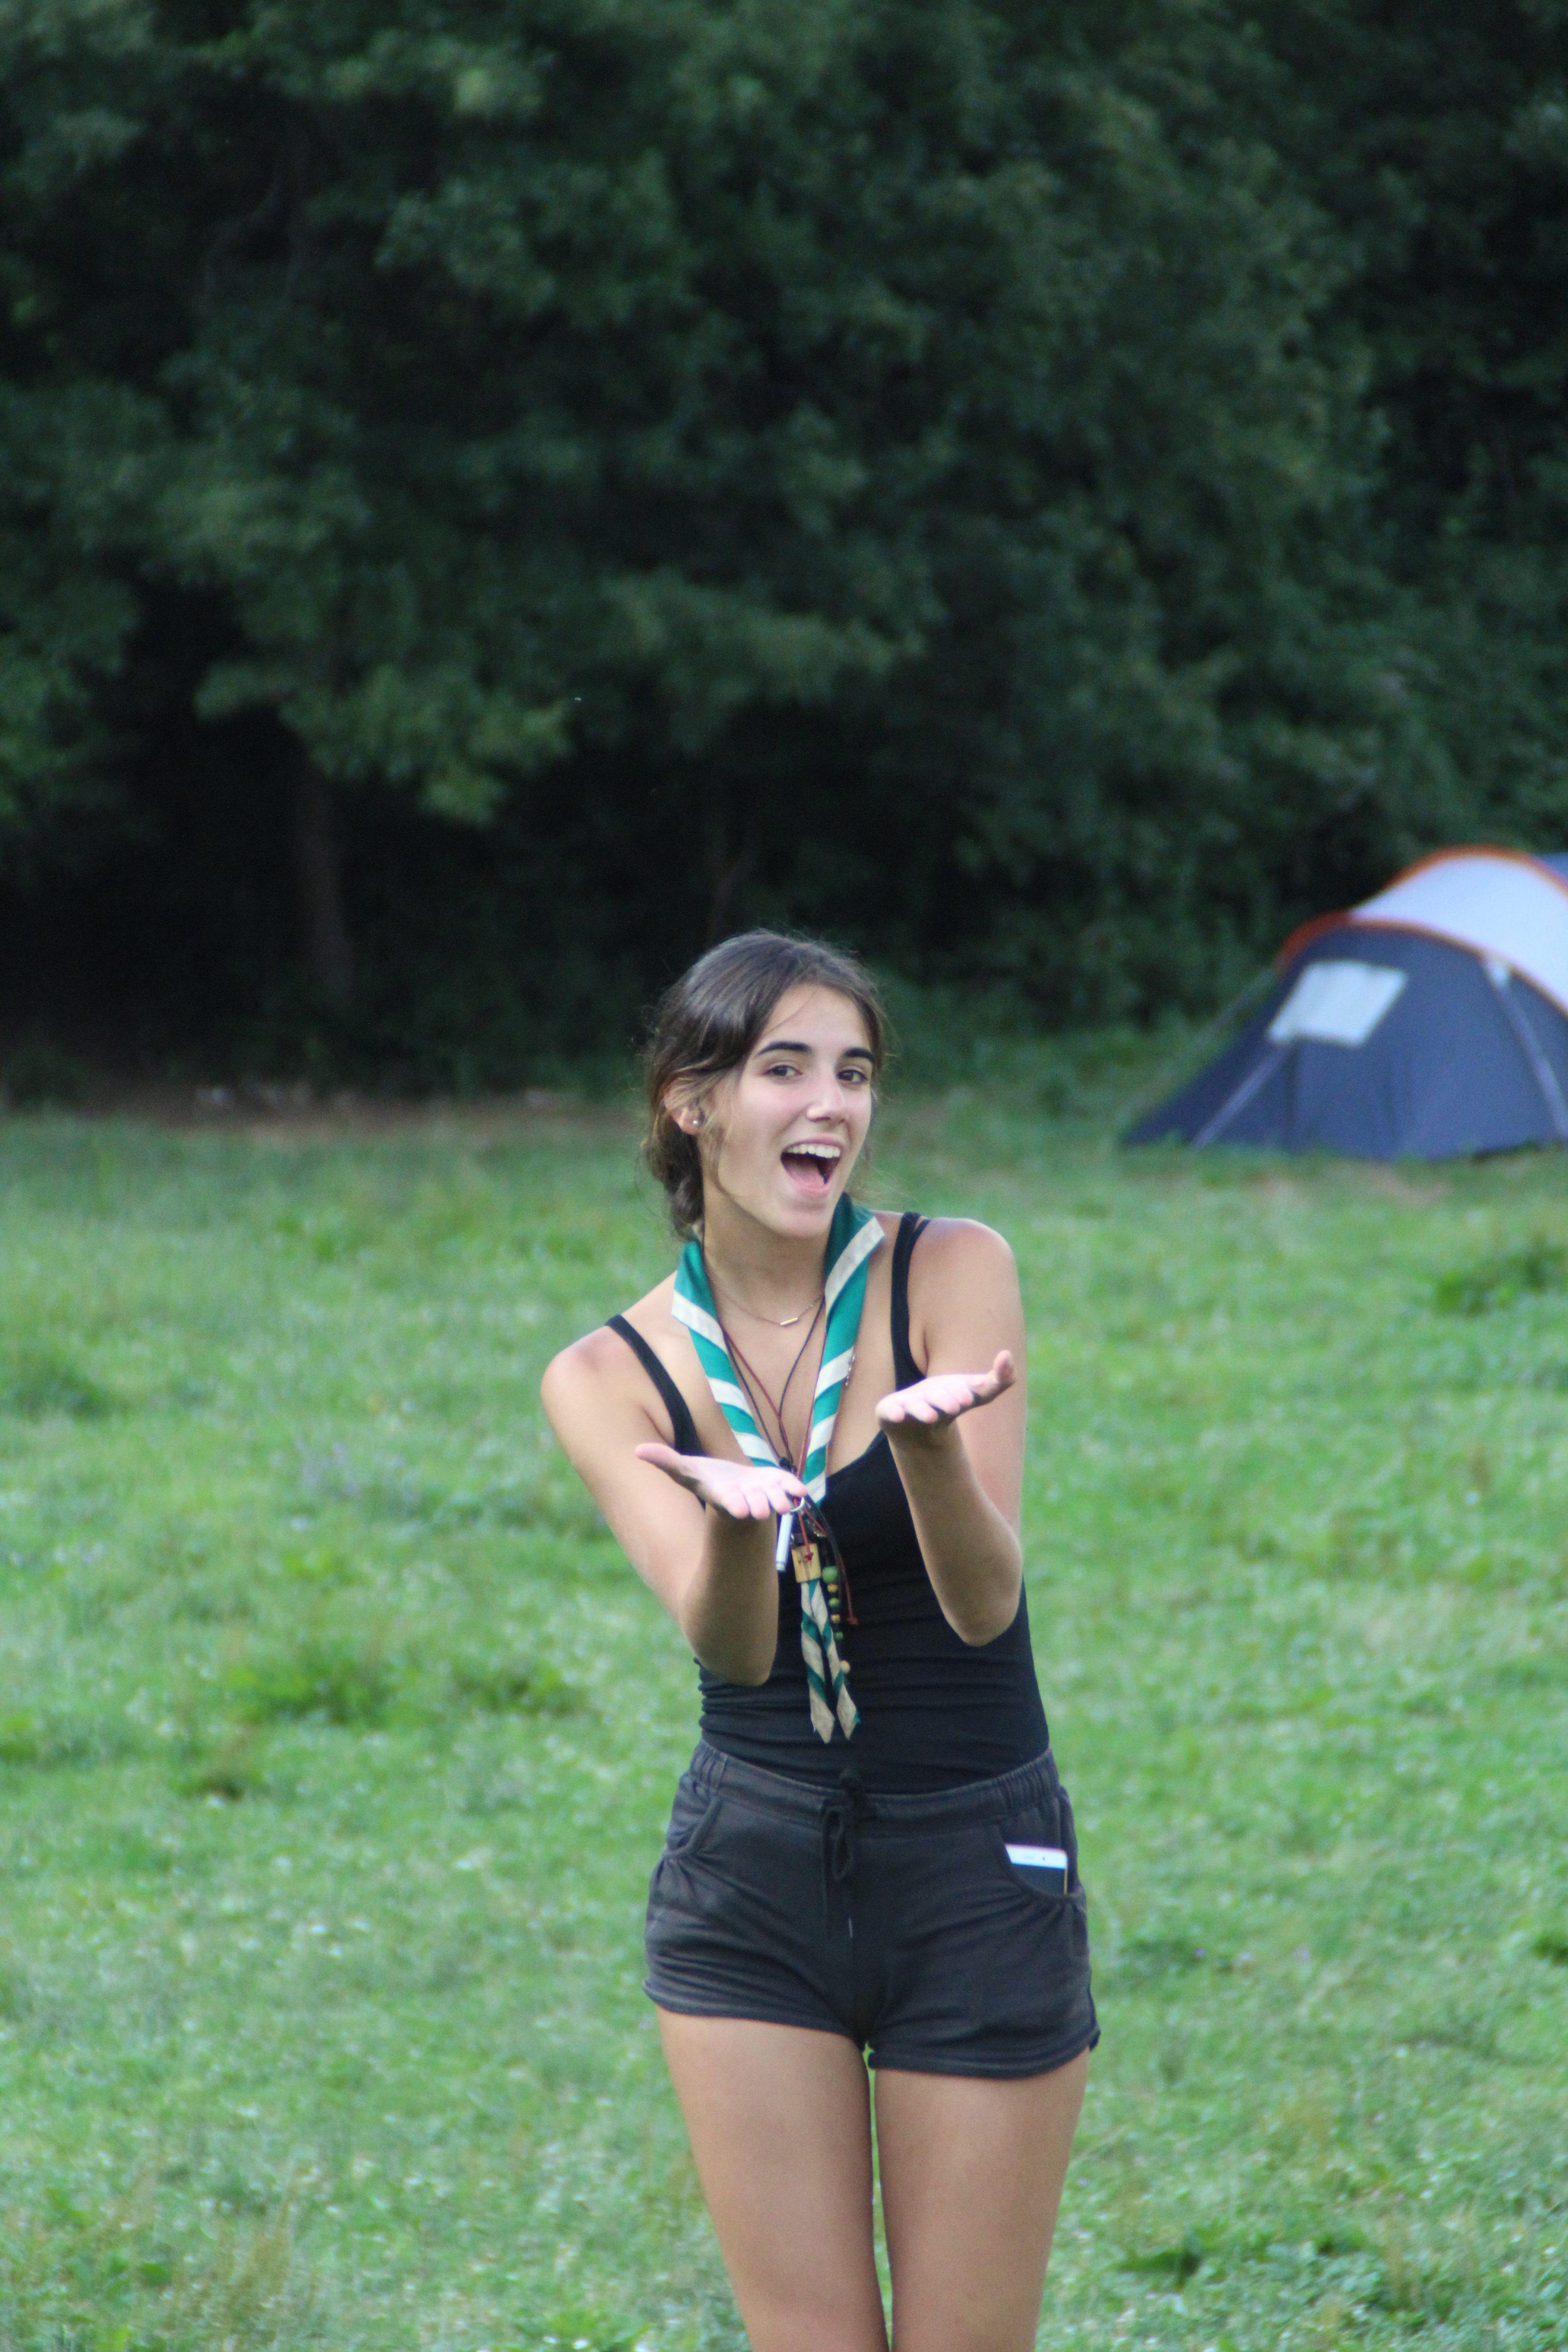 15-16 - Grupo - Campamento de verano - P219